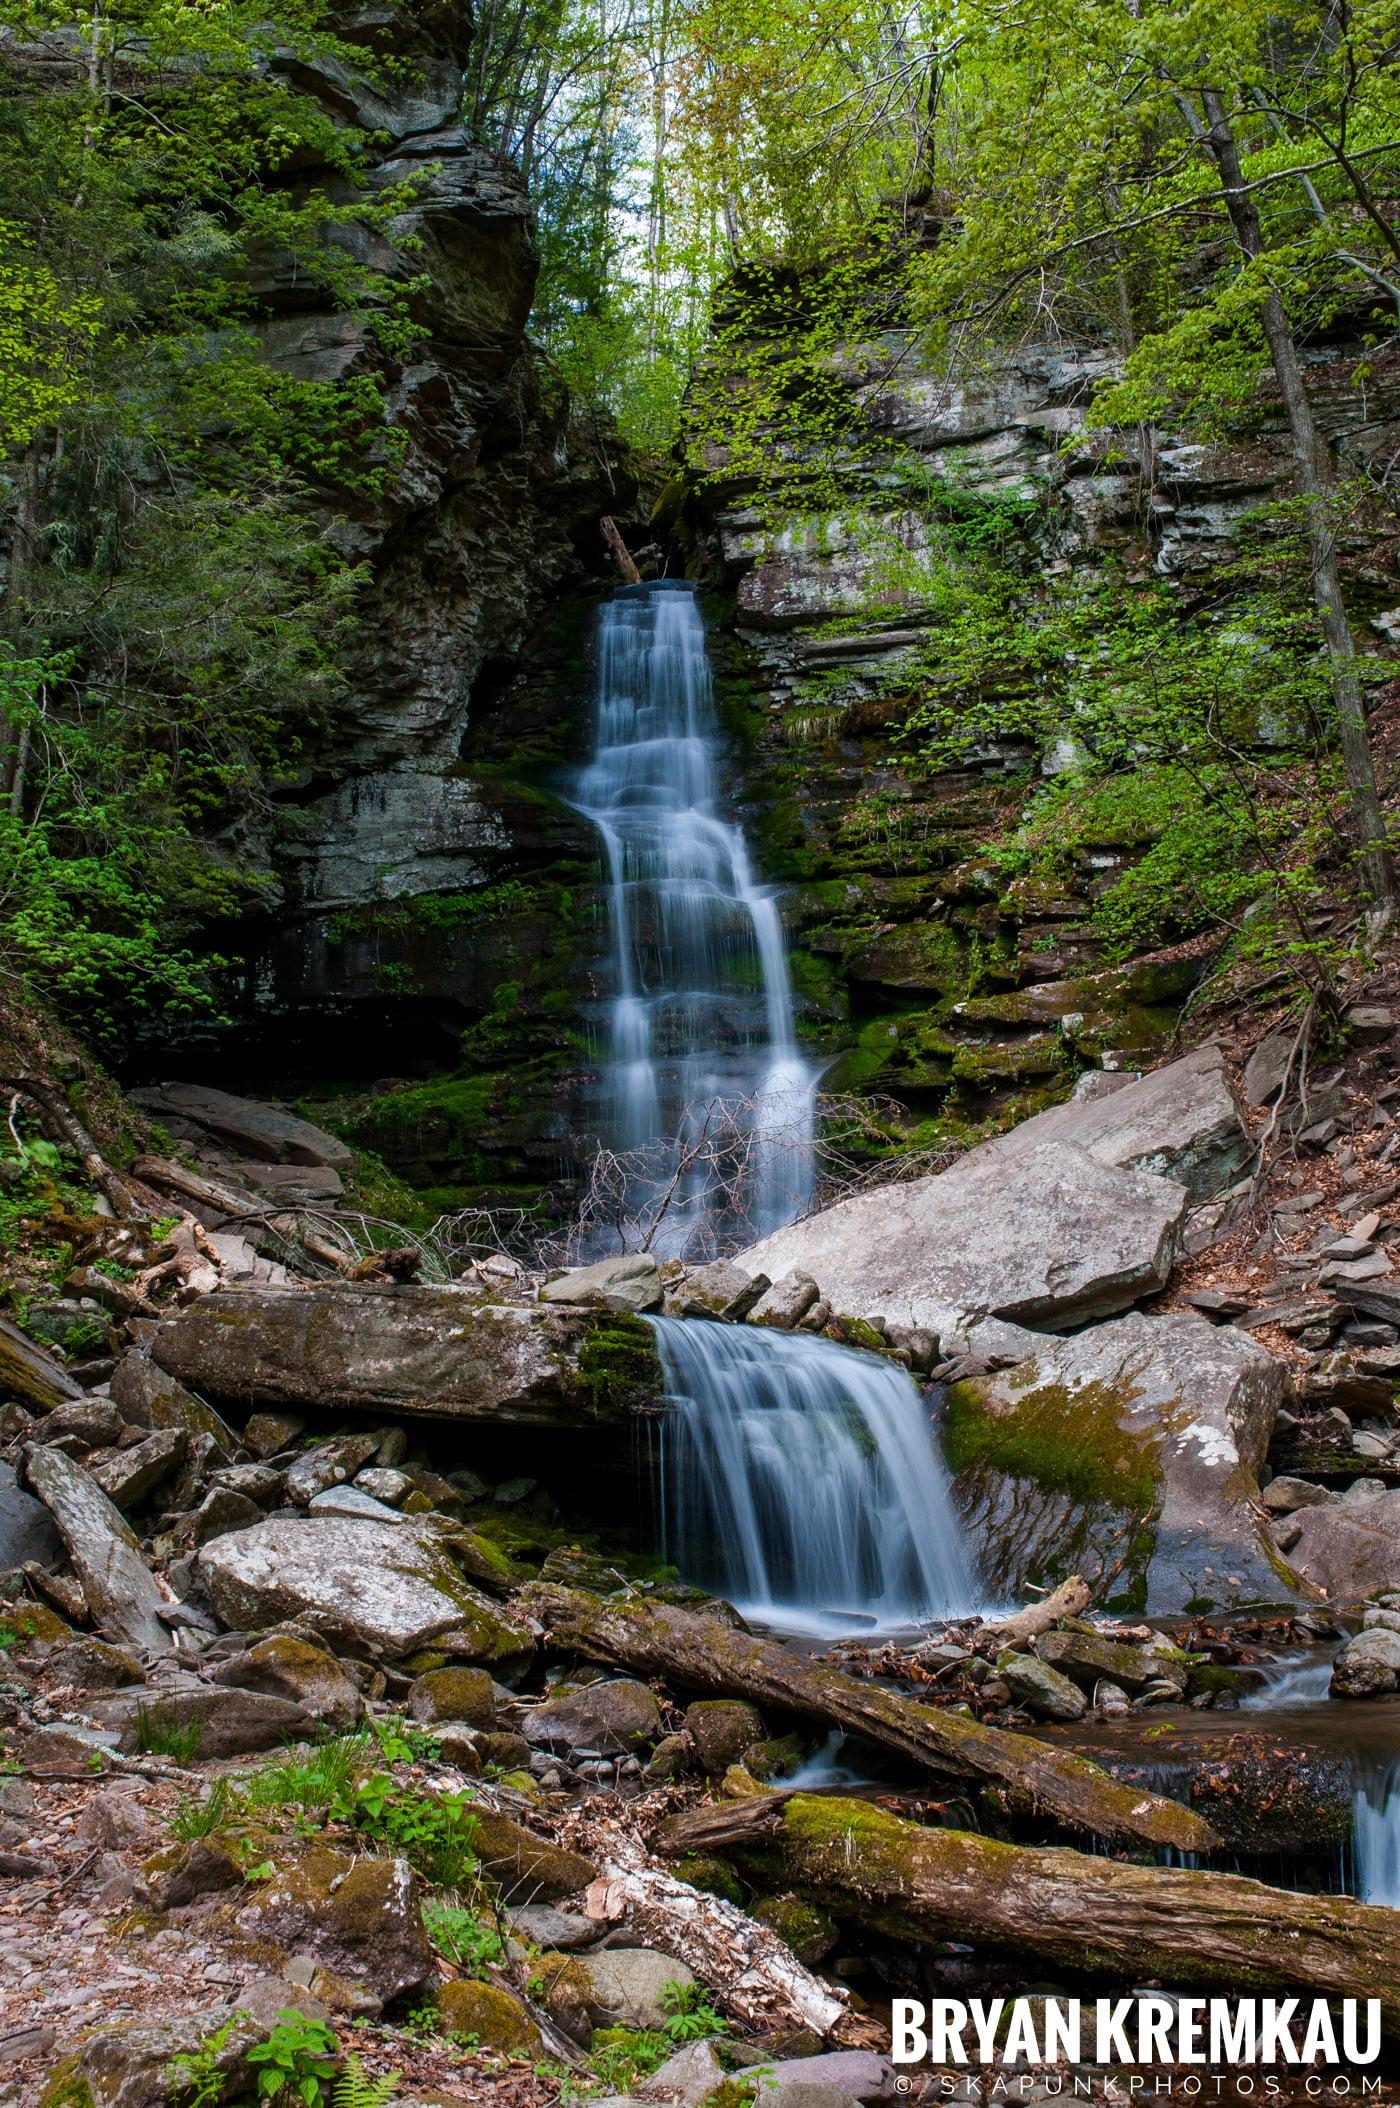 Getting Engaged @ Peekamoose Waterfall, Sundown NY - 5.1.10 (23)